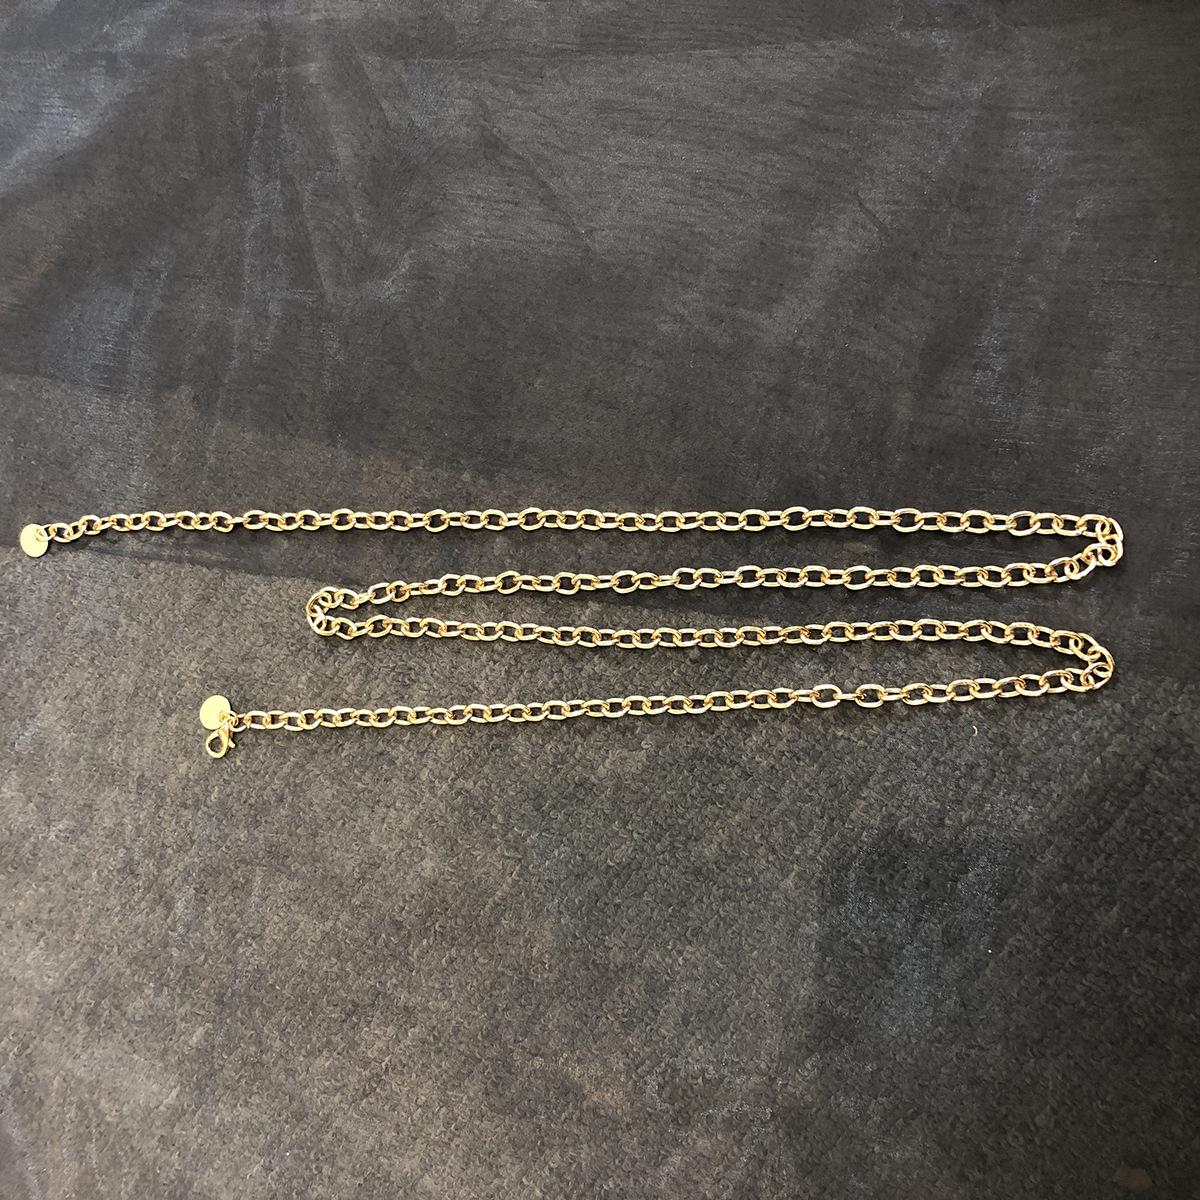 Alloy Fashion Tassel Body accessories  Thin chain alloy 0406  Fashion Jewelry NHXR2716Thinchainalloy0406